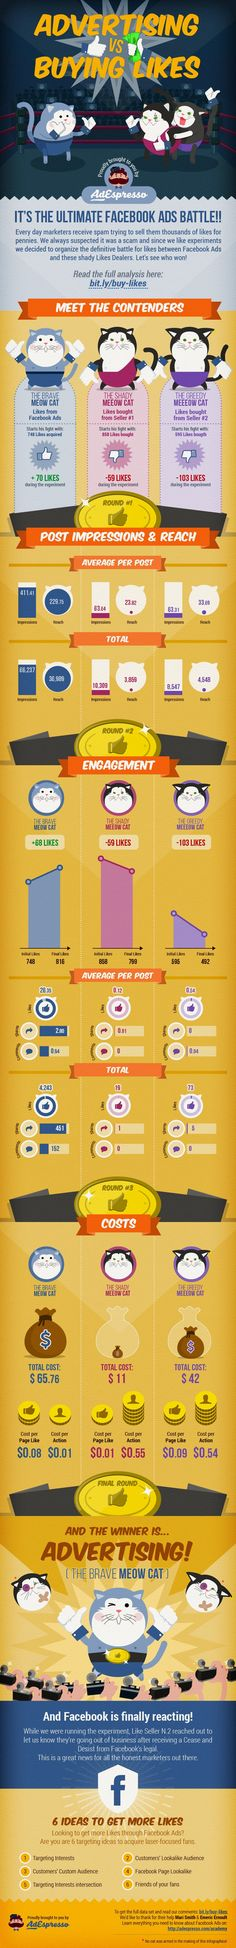 AdEspresso Infographic Advertising vs Buying Likes Facebook Business, Facebook Marketing, Marketing Digital, Online Marketing, Social Media Marketing, Marketing Technology, Online Advertising, Buy Youtube Subscribers, Facebook Likes